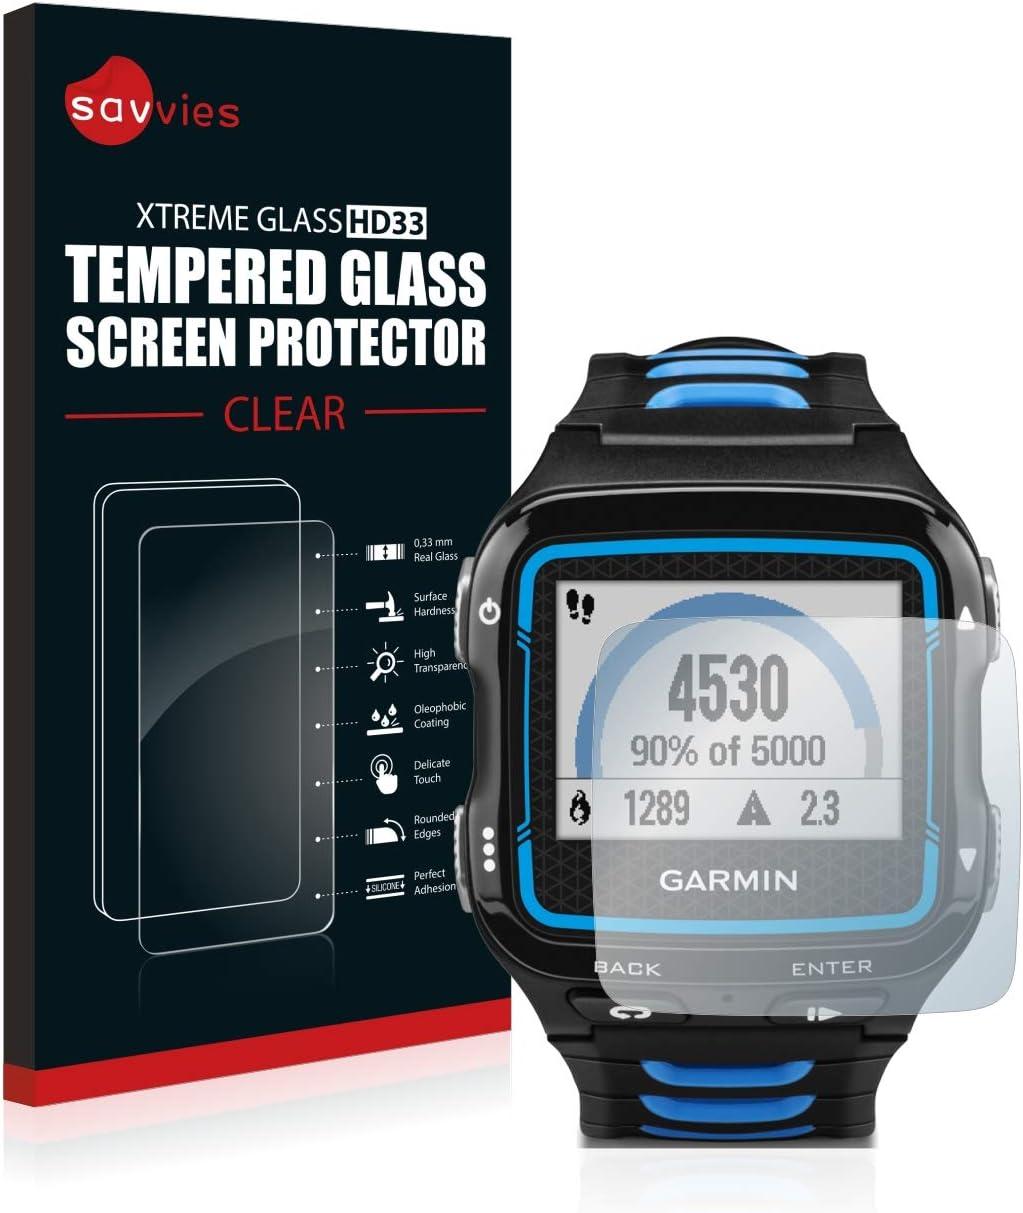 savvies Cristal Templado Compatible con Garmin Forerunner 920XT Protector Pantalla Vidrio Proteccion 9H Pelicula Anti-Huellas